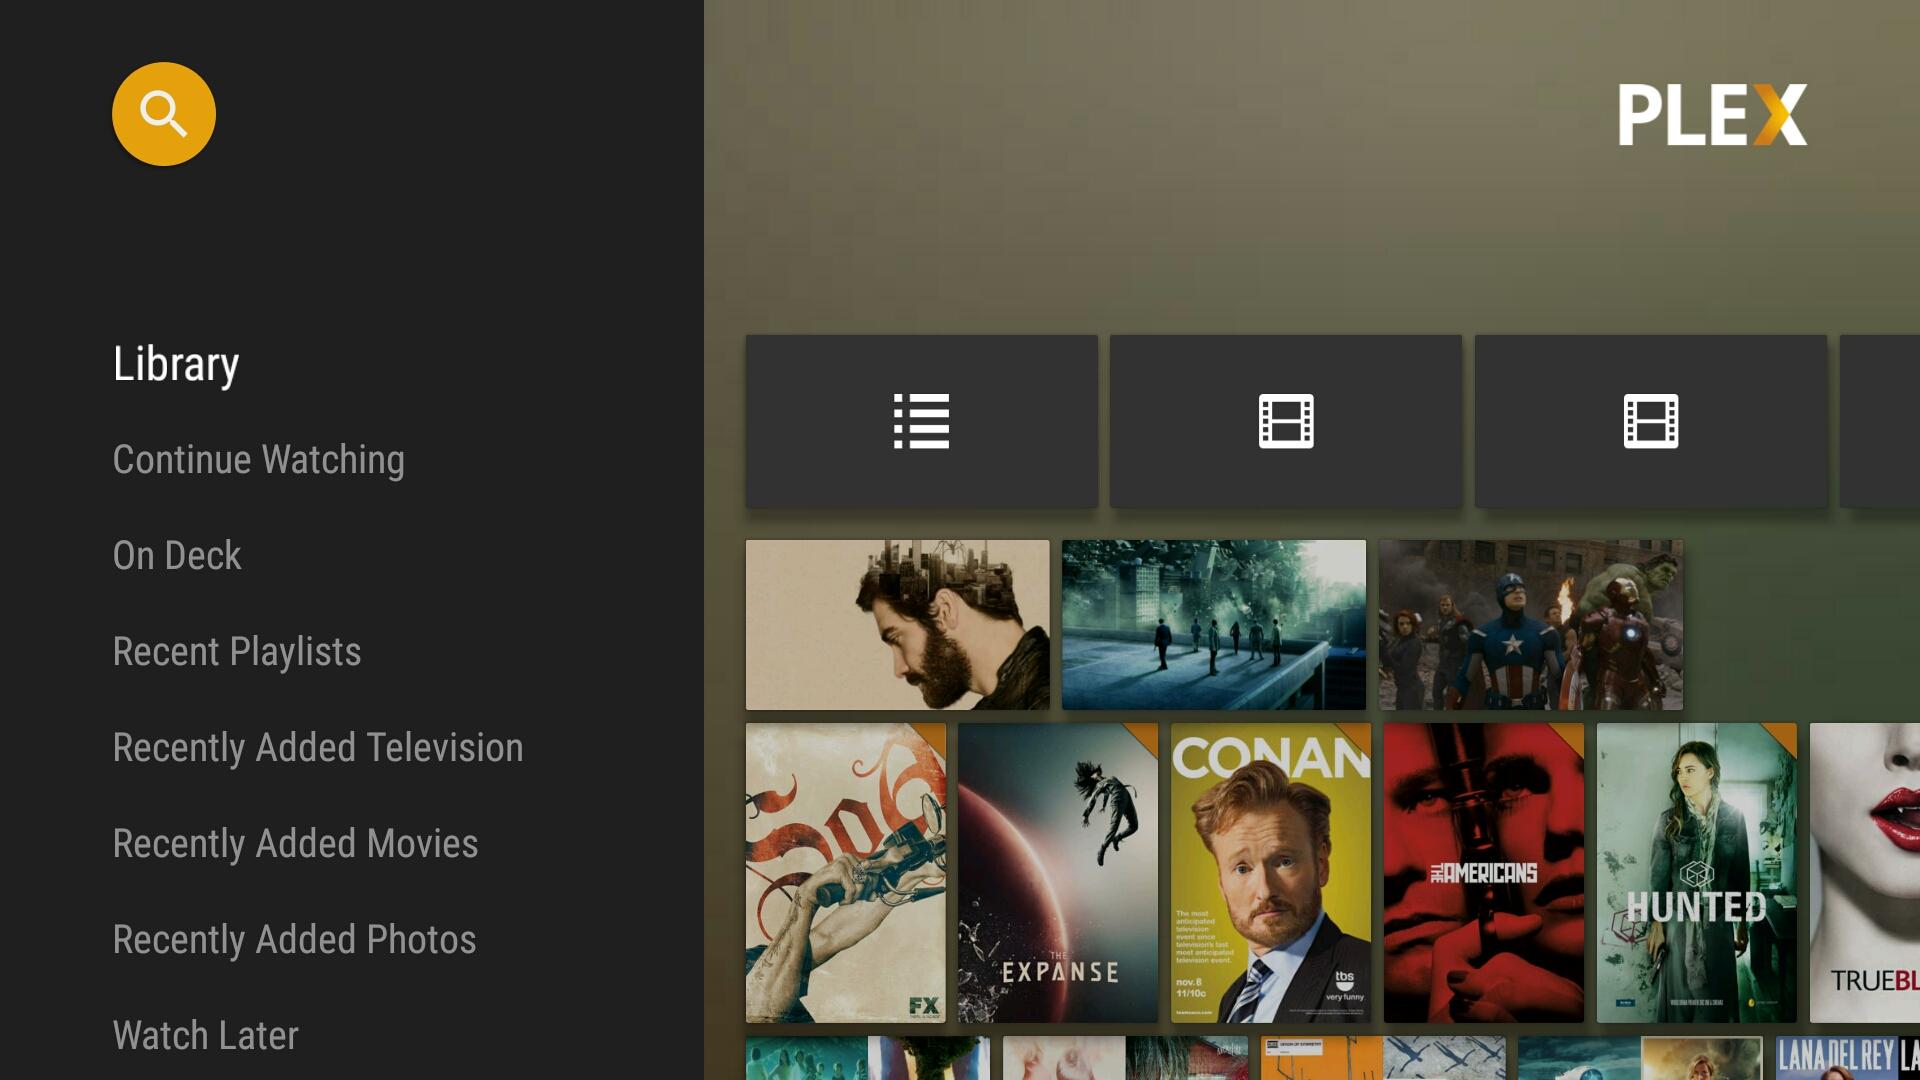 Plex picks up Google Assistant integration on Android TV